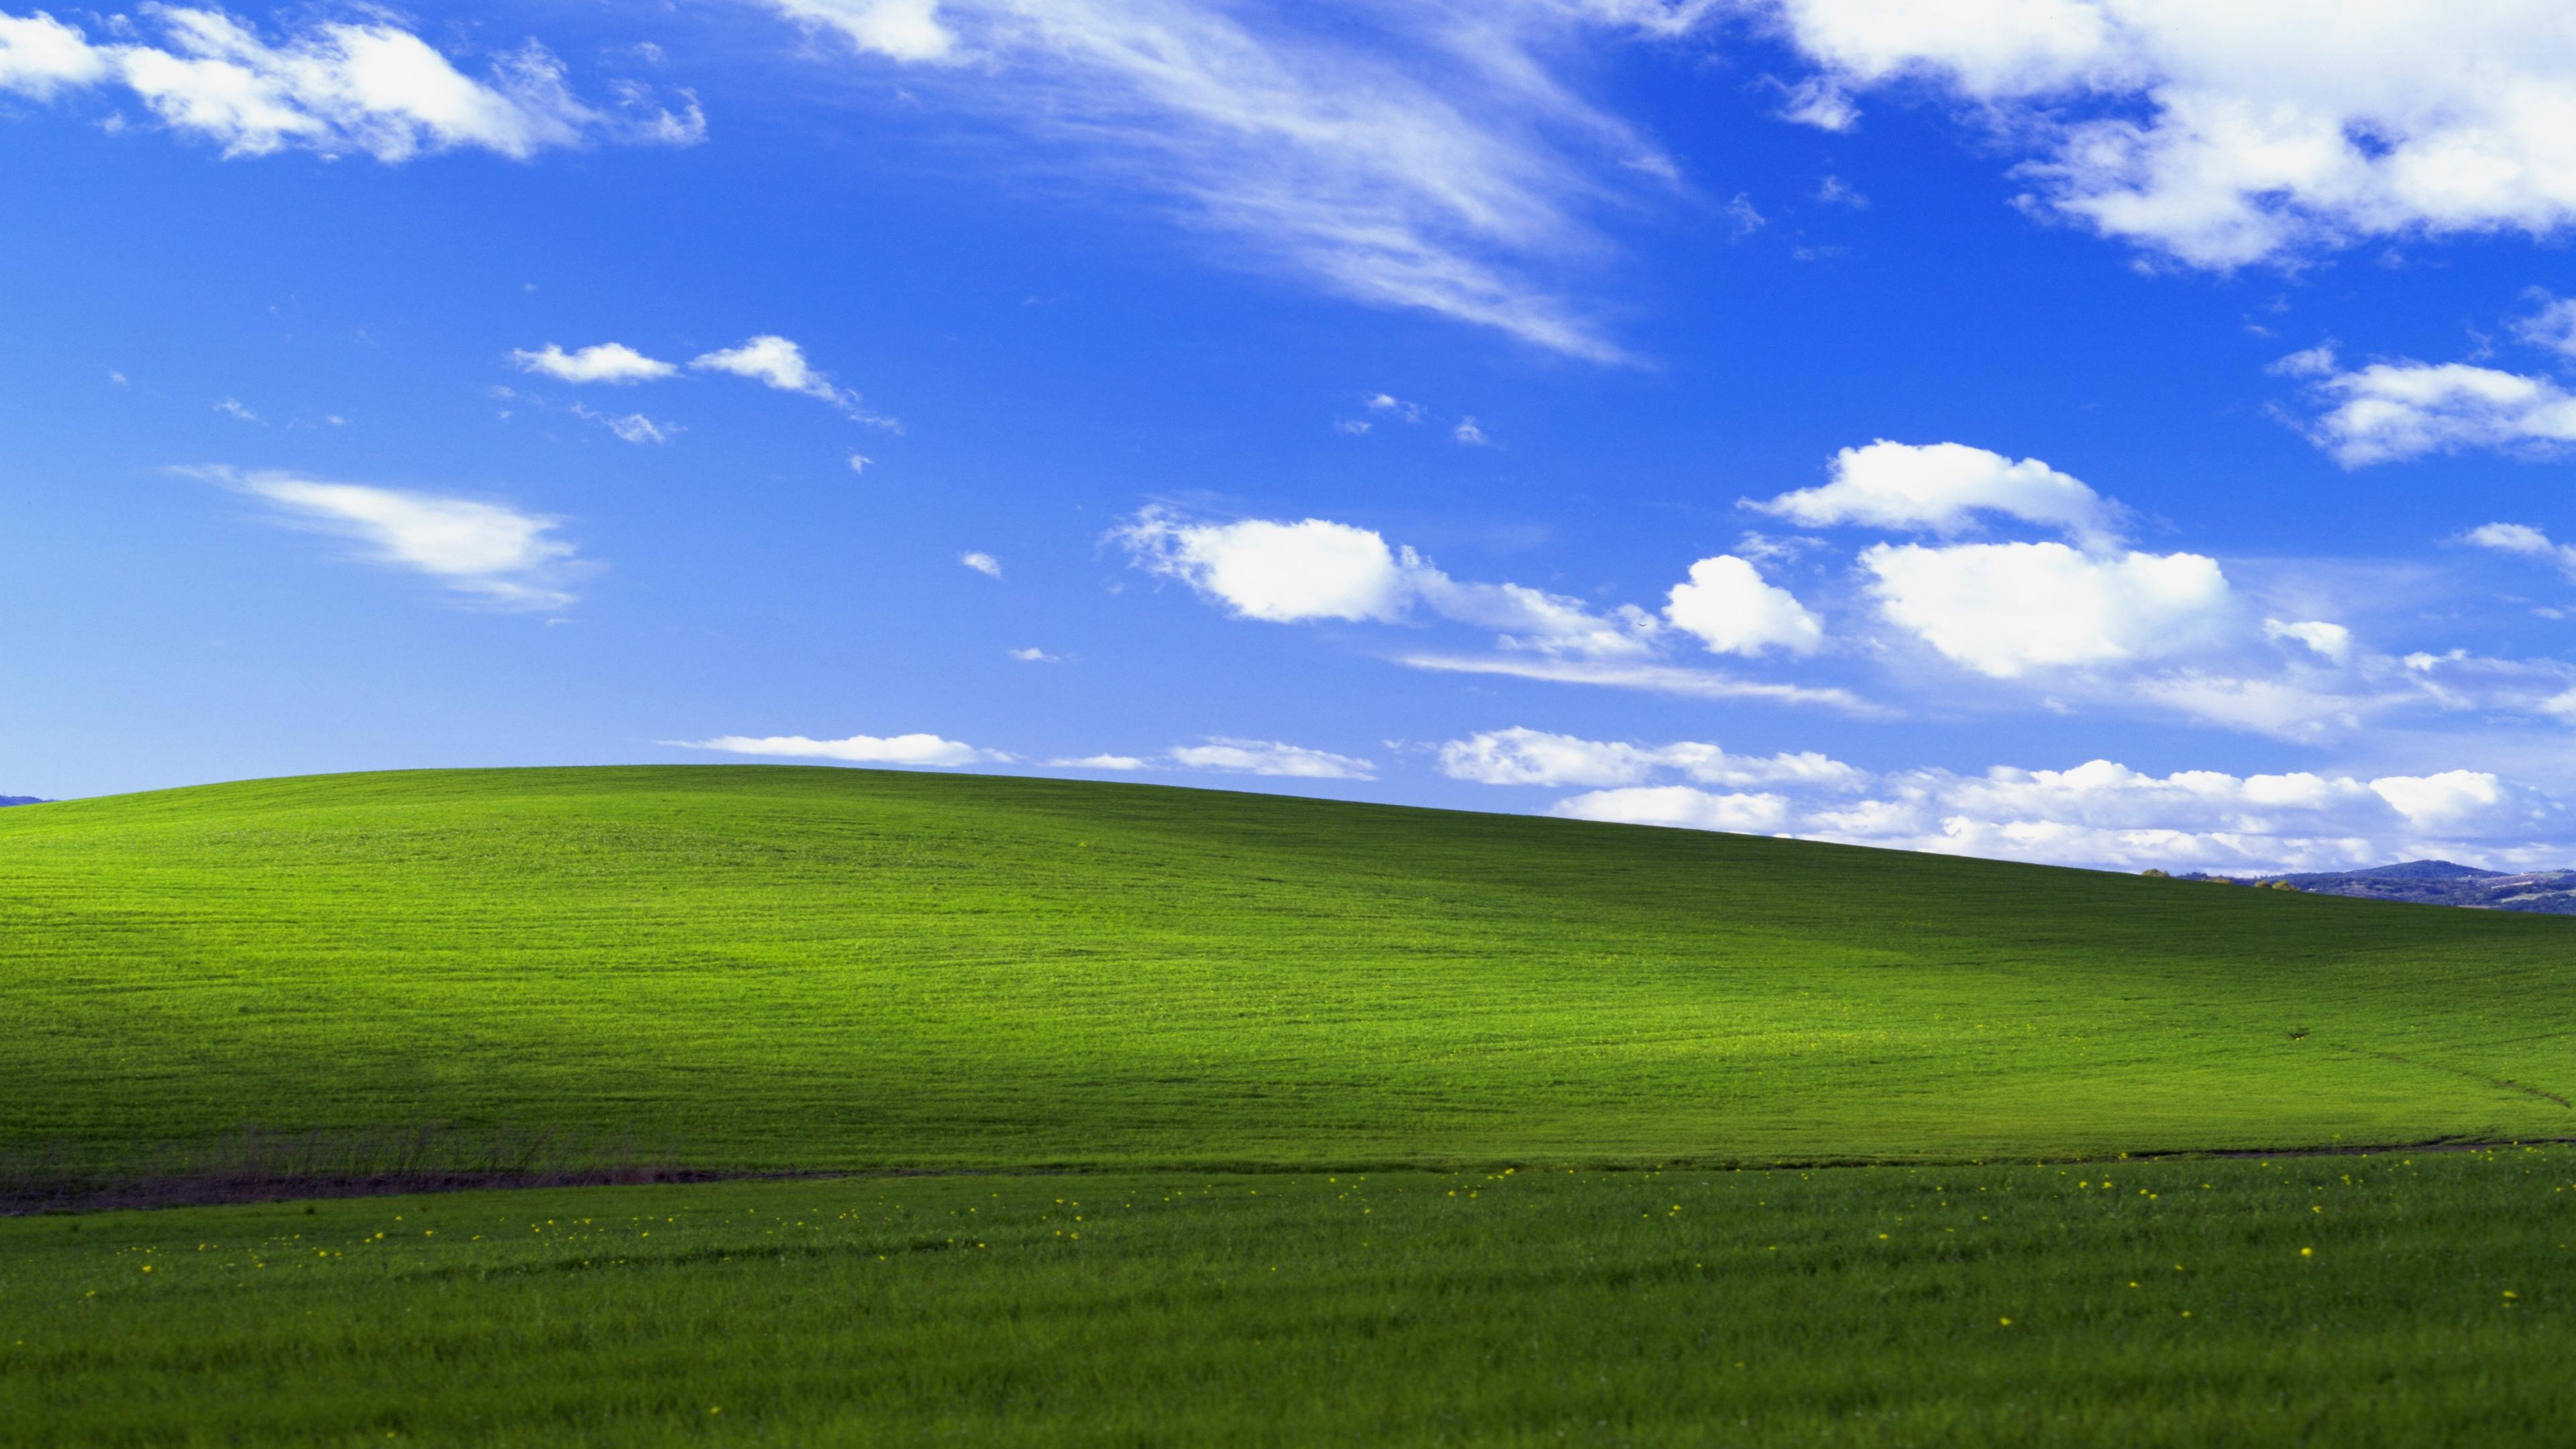 In honor of Windows XP I made a 4k version of Bliss iimgurcom 3840x2160